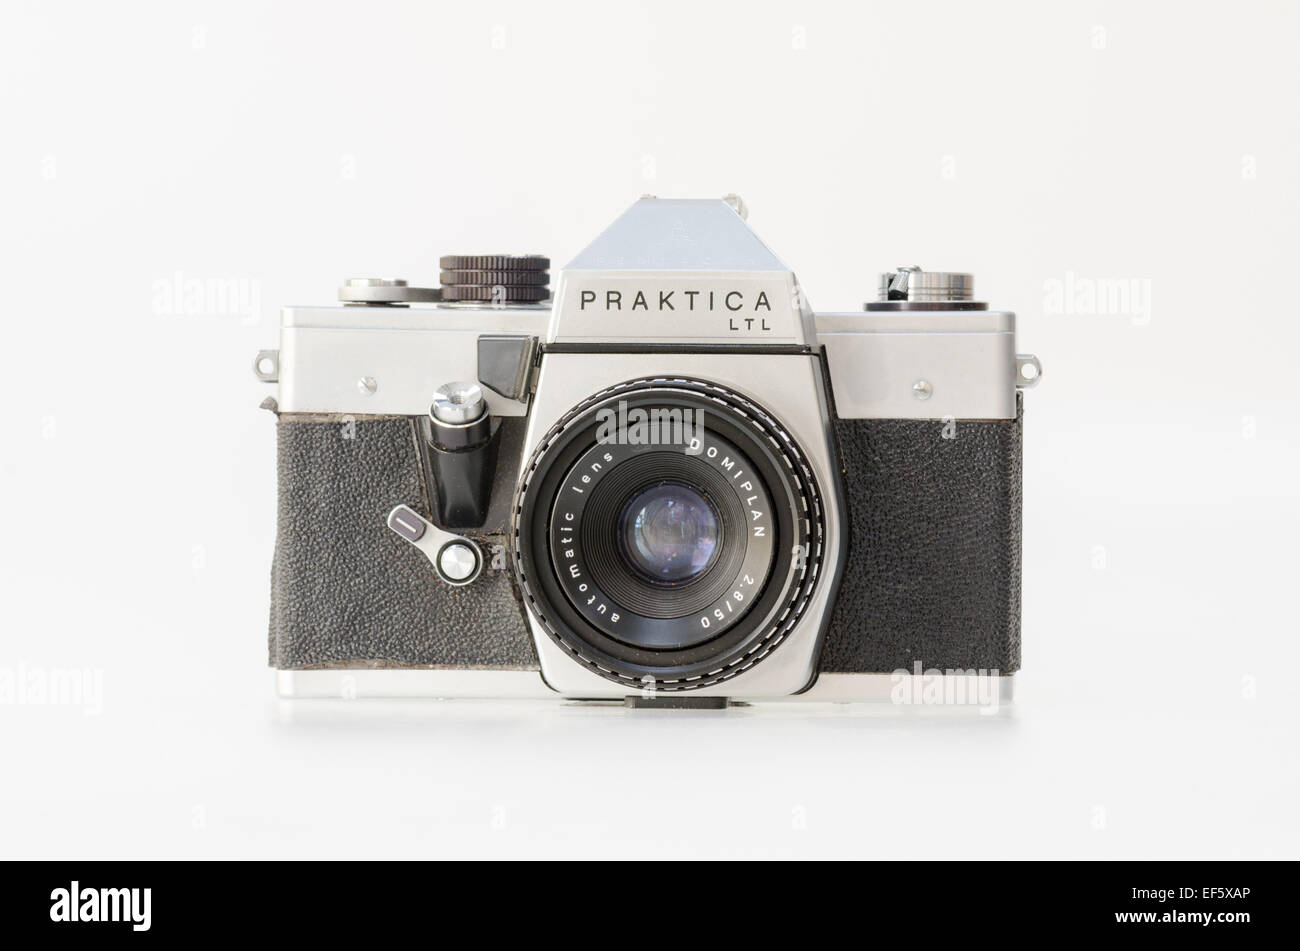 Silver Praktica LTL 35mm film slr camera - Stock Image